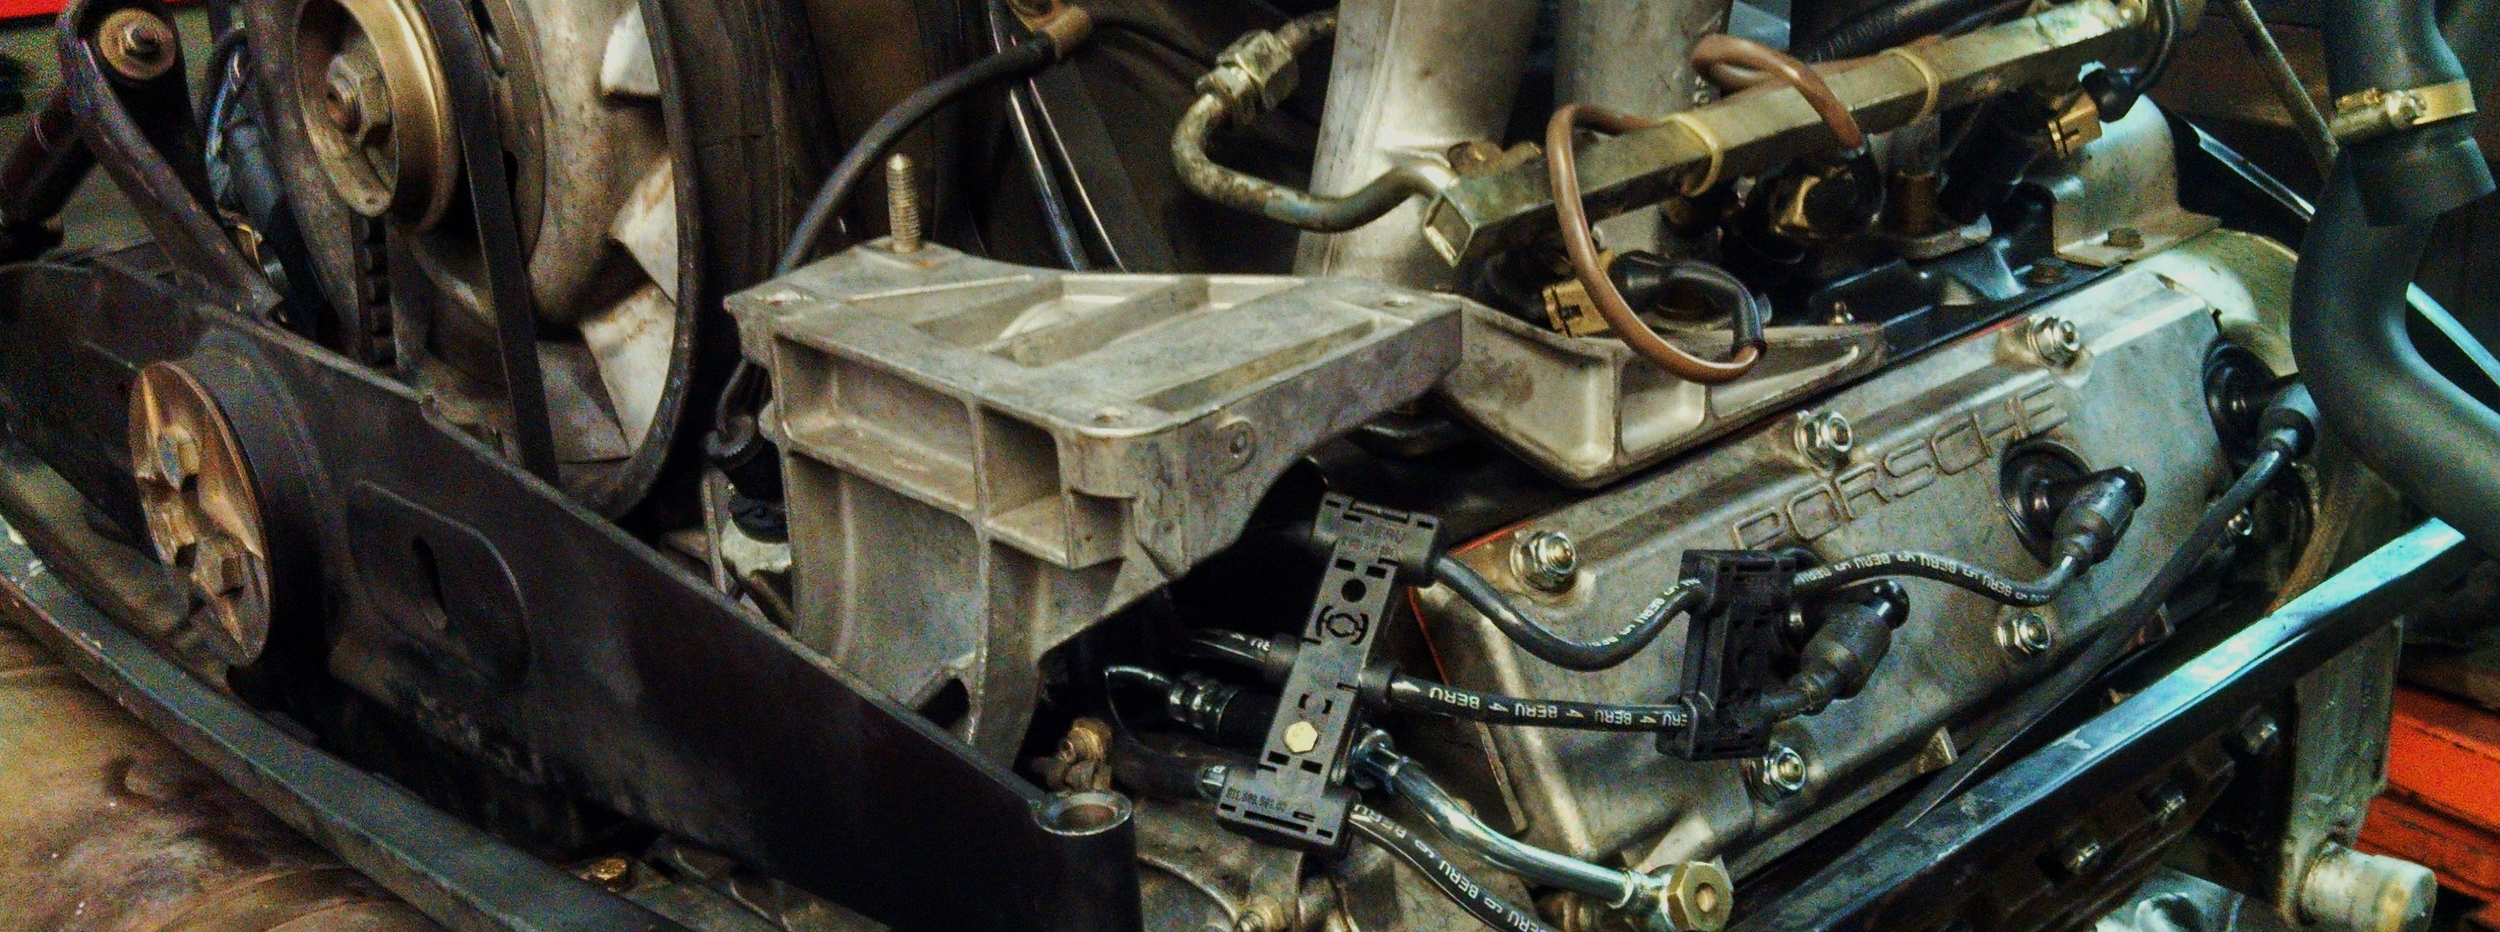 911 engine.jpg